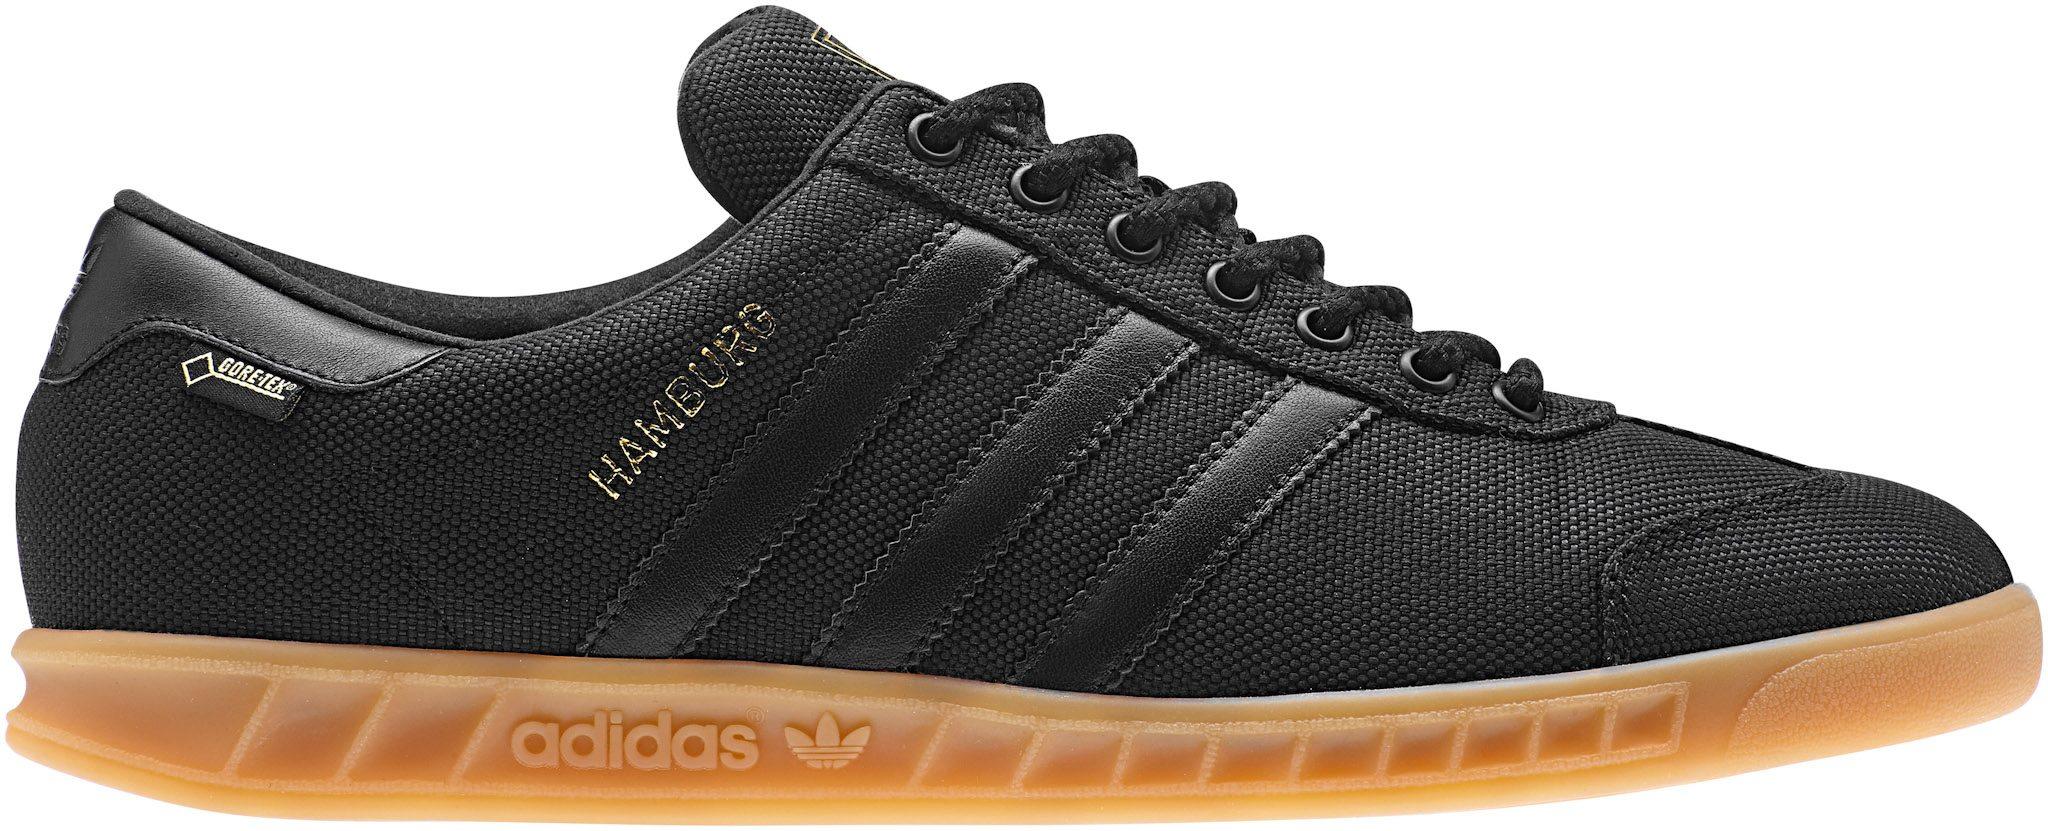 adidas Originals Hamburg GTX 6